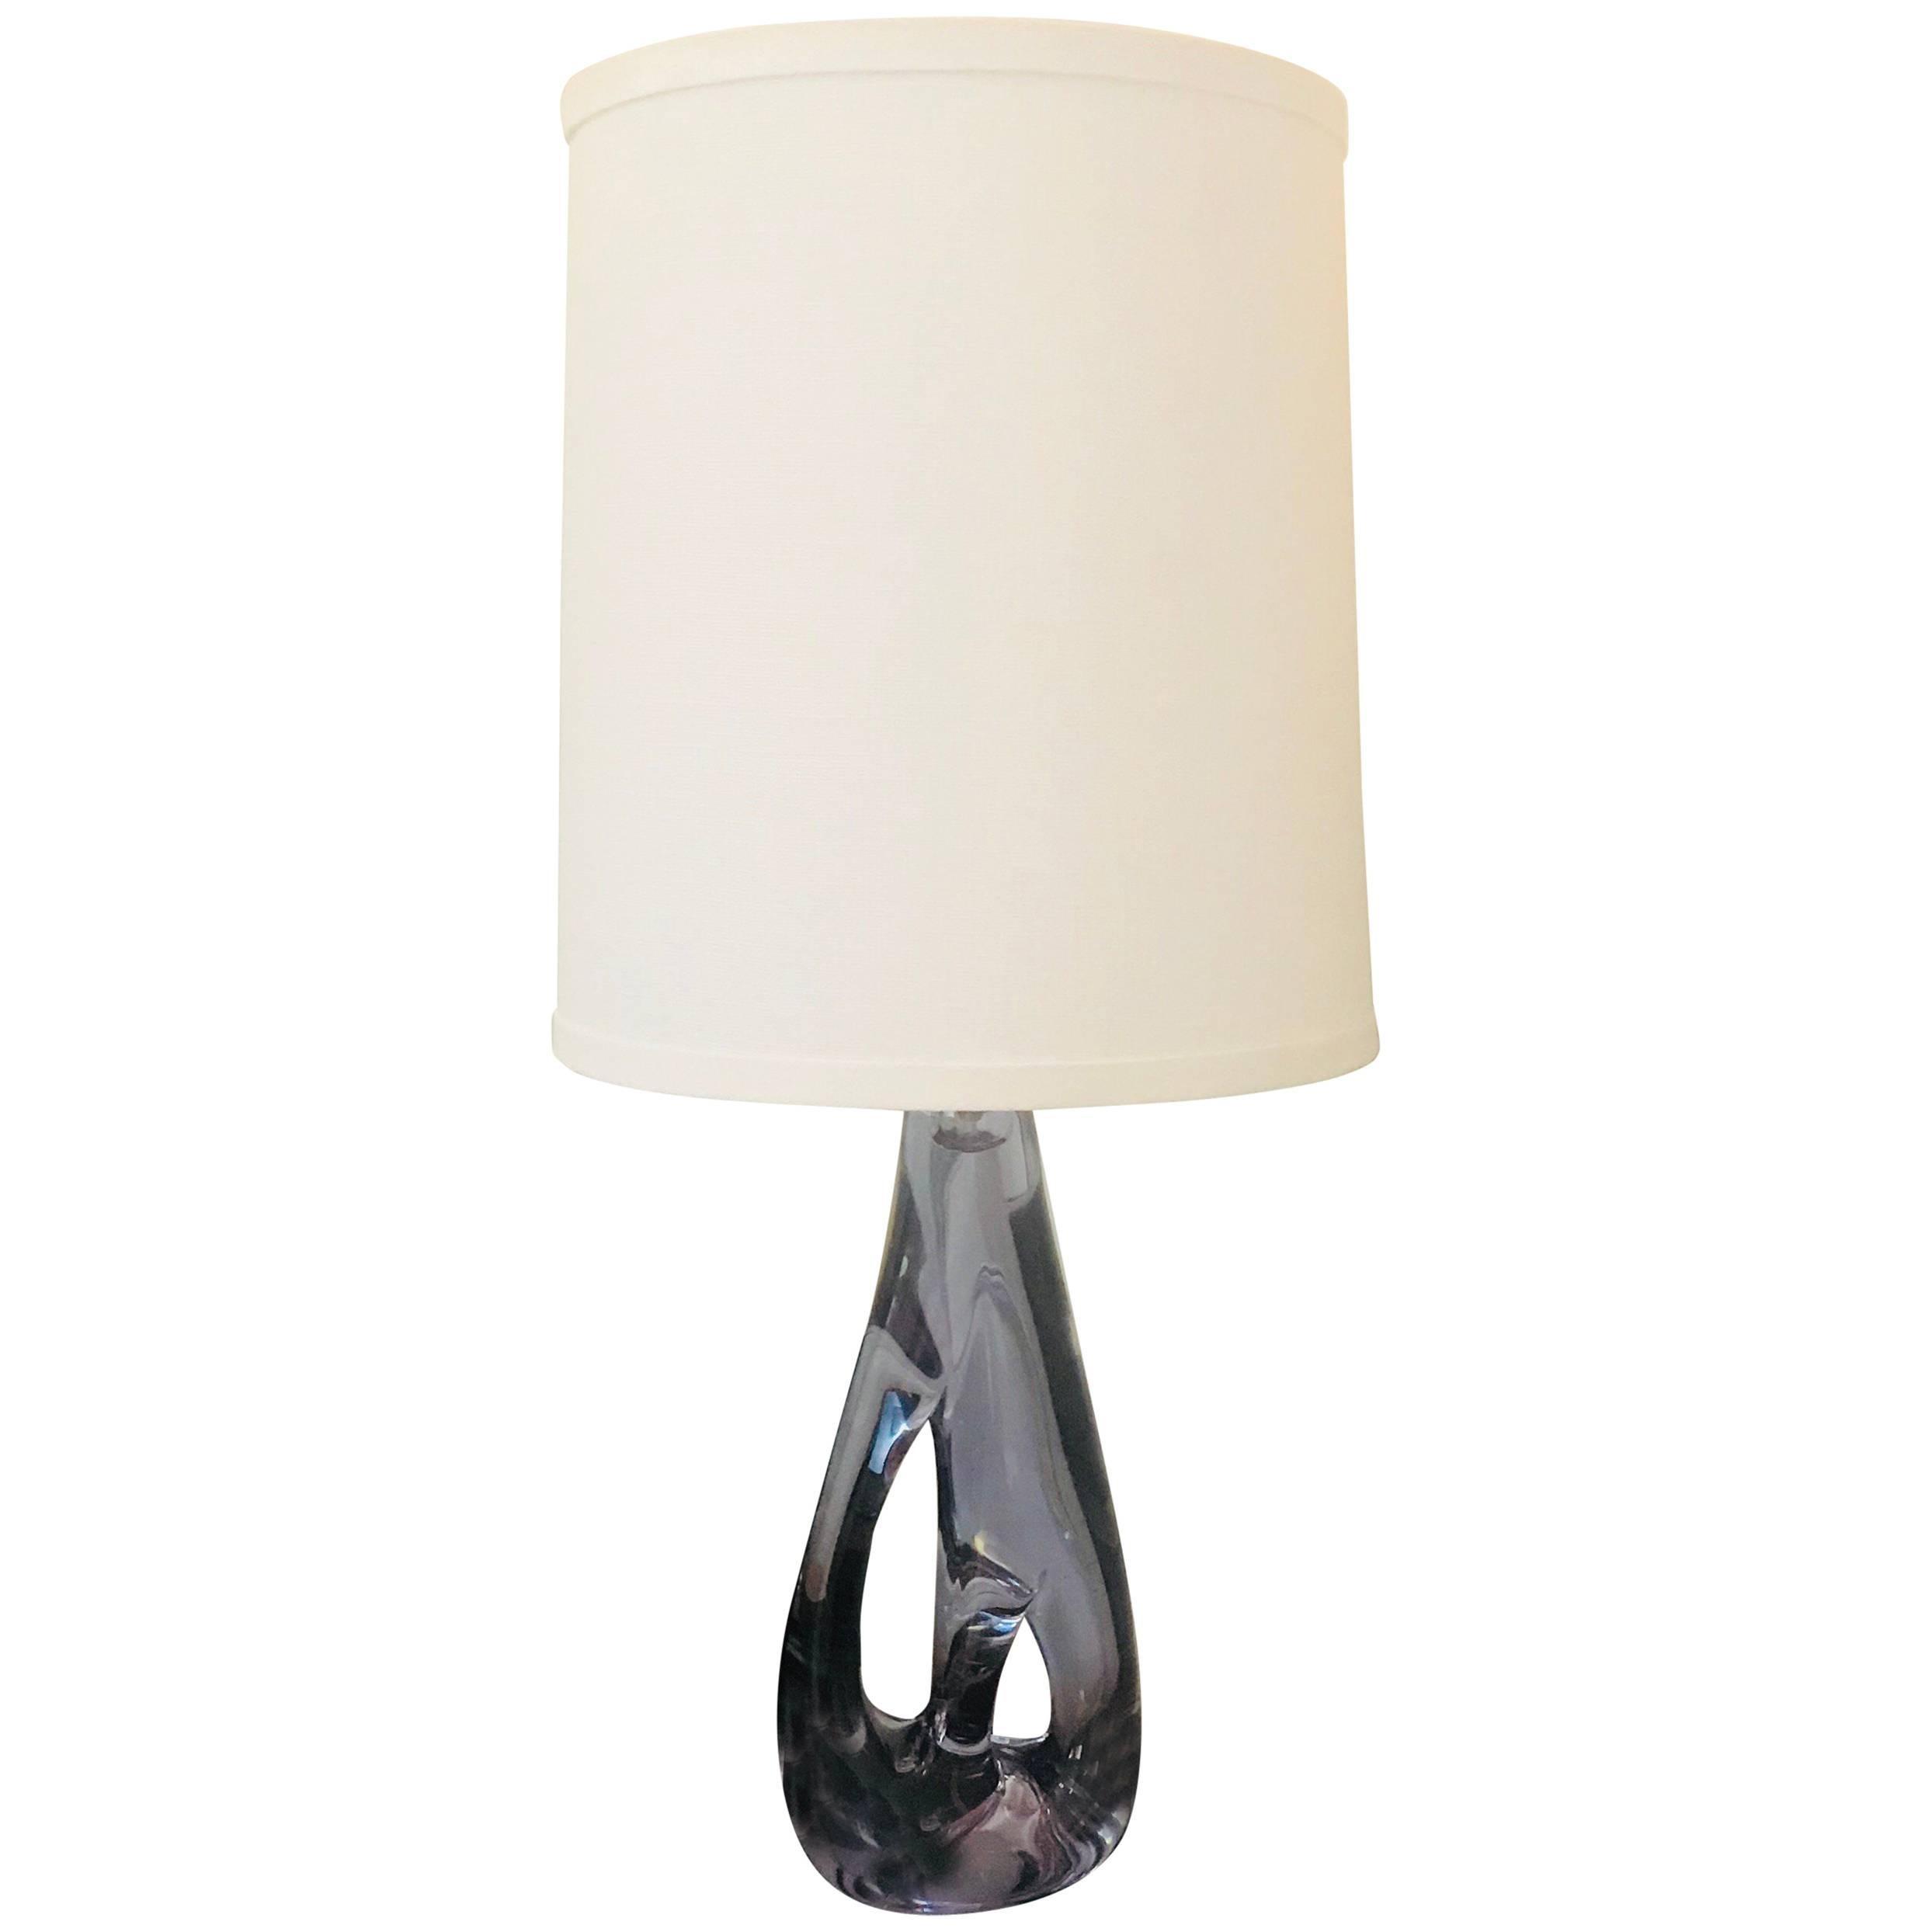 Lamp Crystal Sèvres Elegant Shape Antiques Antique Furniture